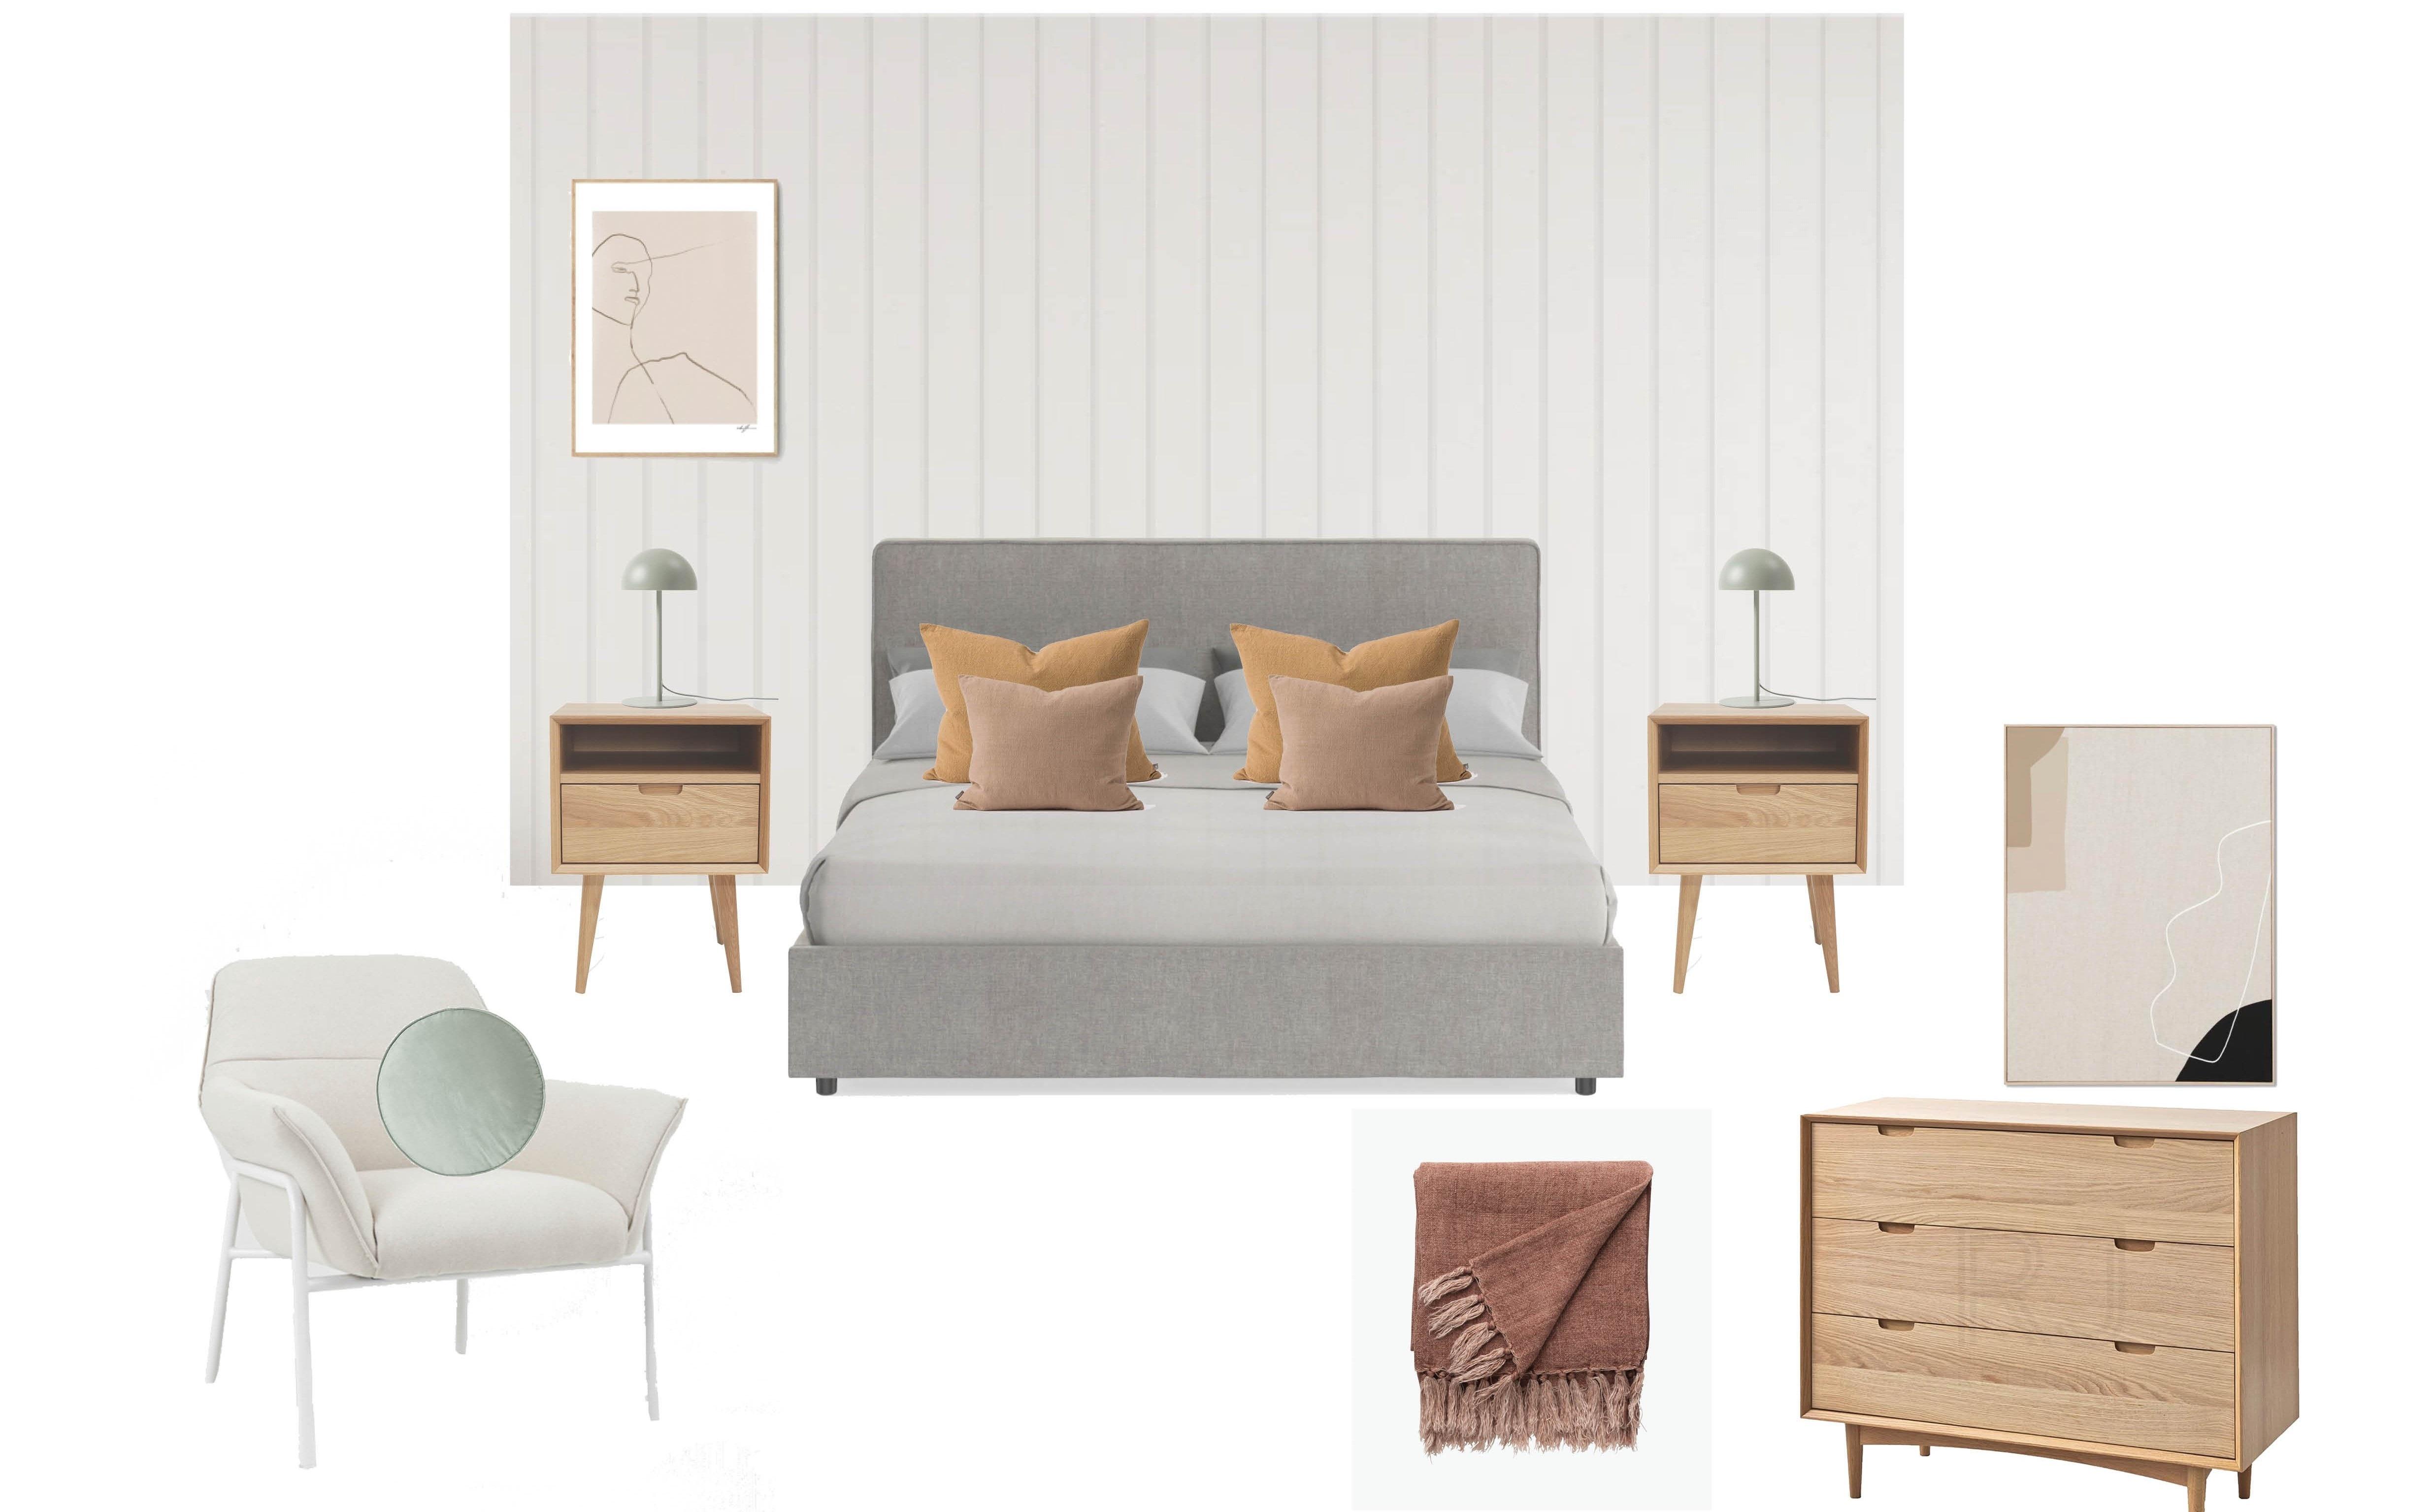 Final visualisation board for Alana's Master Bedroom